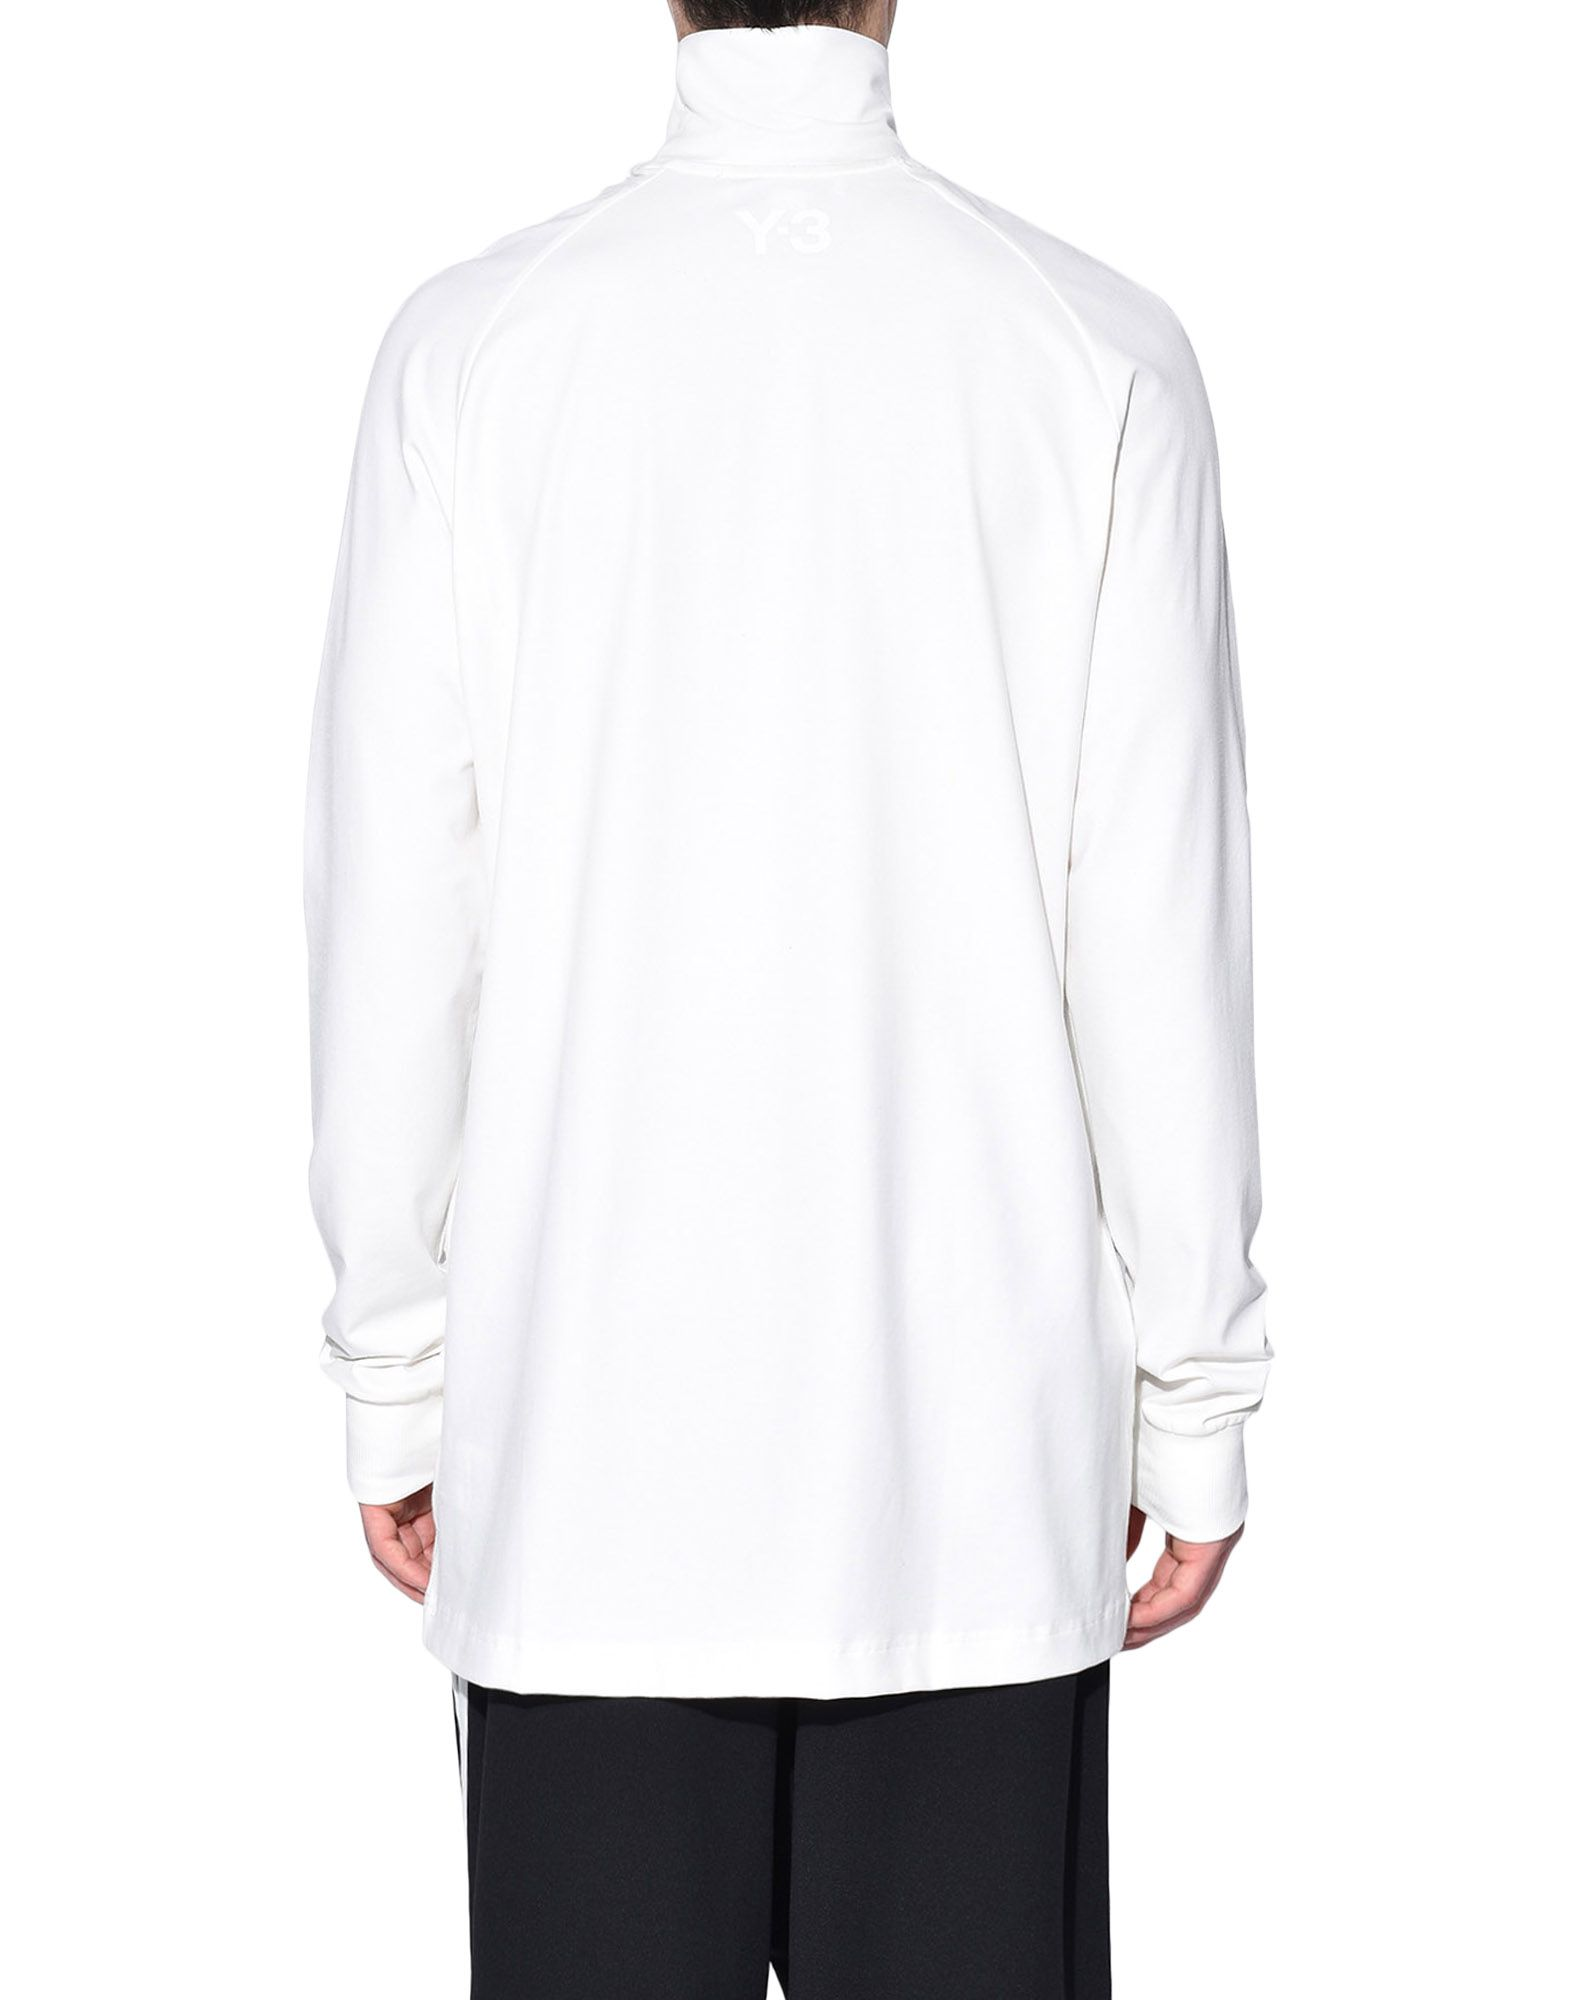 Y-3 Y-3 3-Stripes High Neck Tee Long sleeve t-shirt Man d